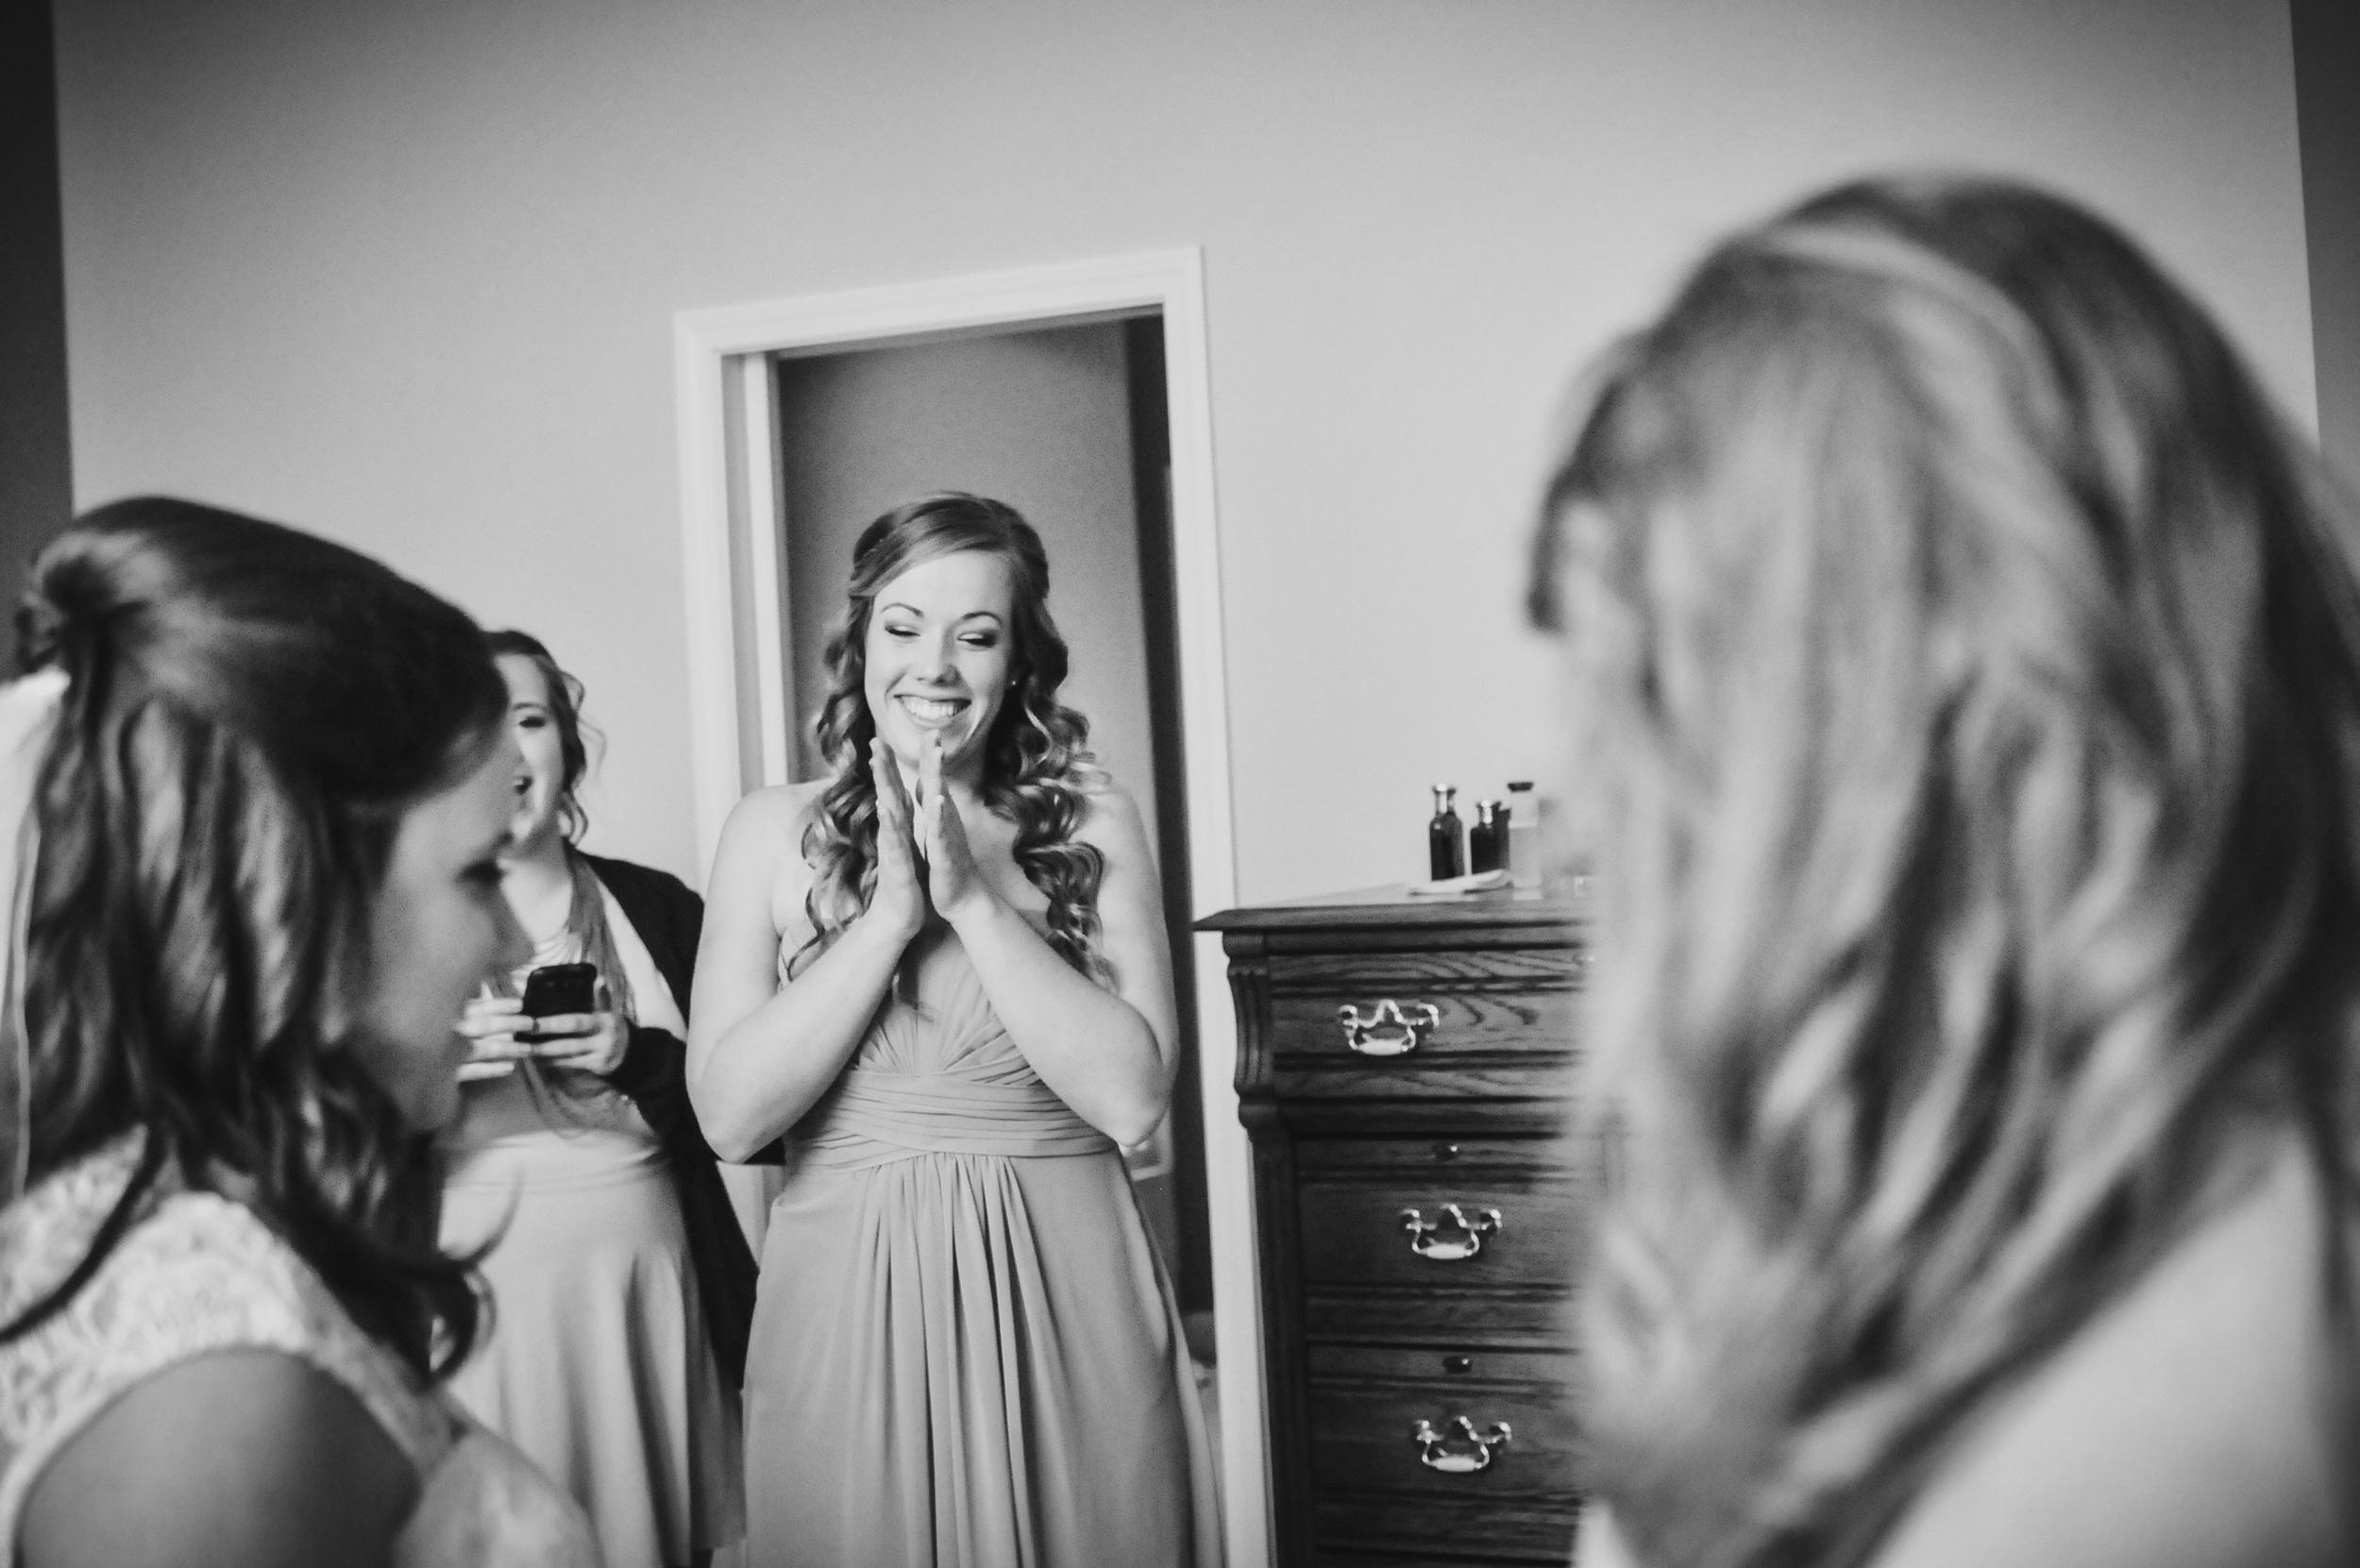 cornerstone-buidling-peoria-wedding-photographer-8.jpg